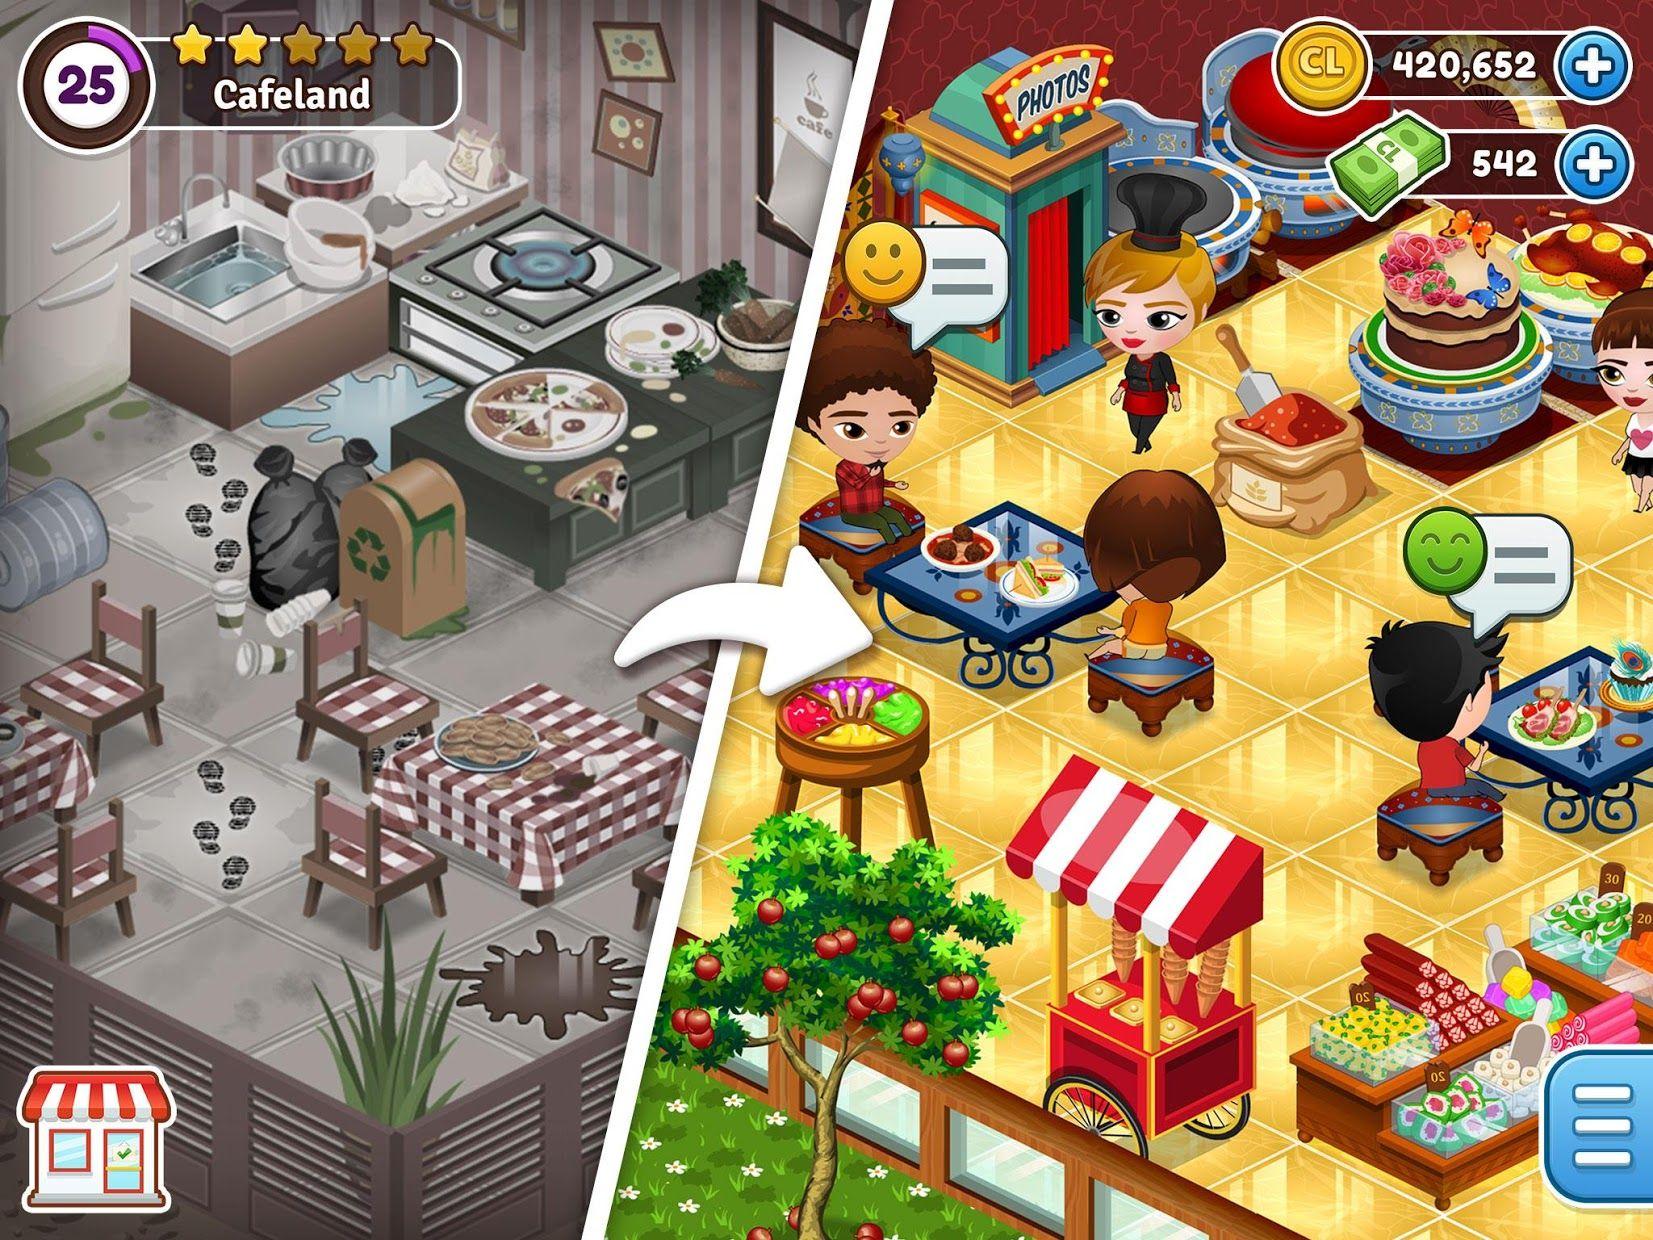 Cafeland - 餐厅游戏 游戏截图1